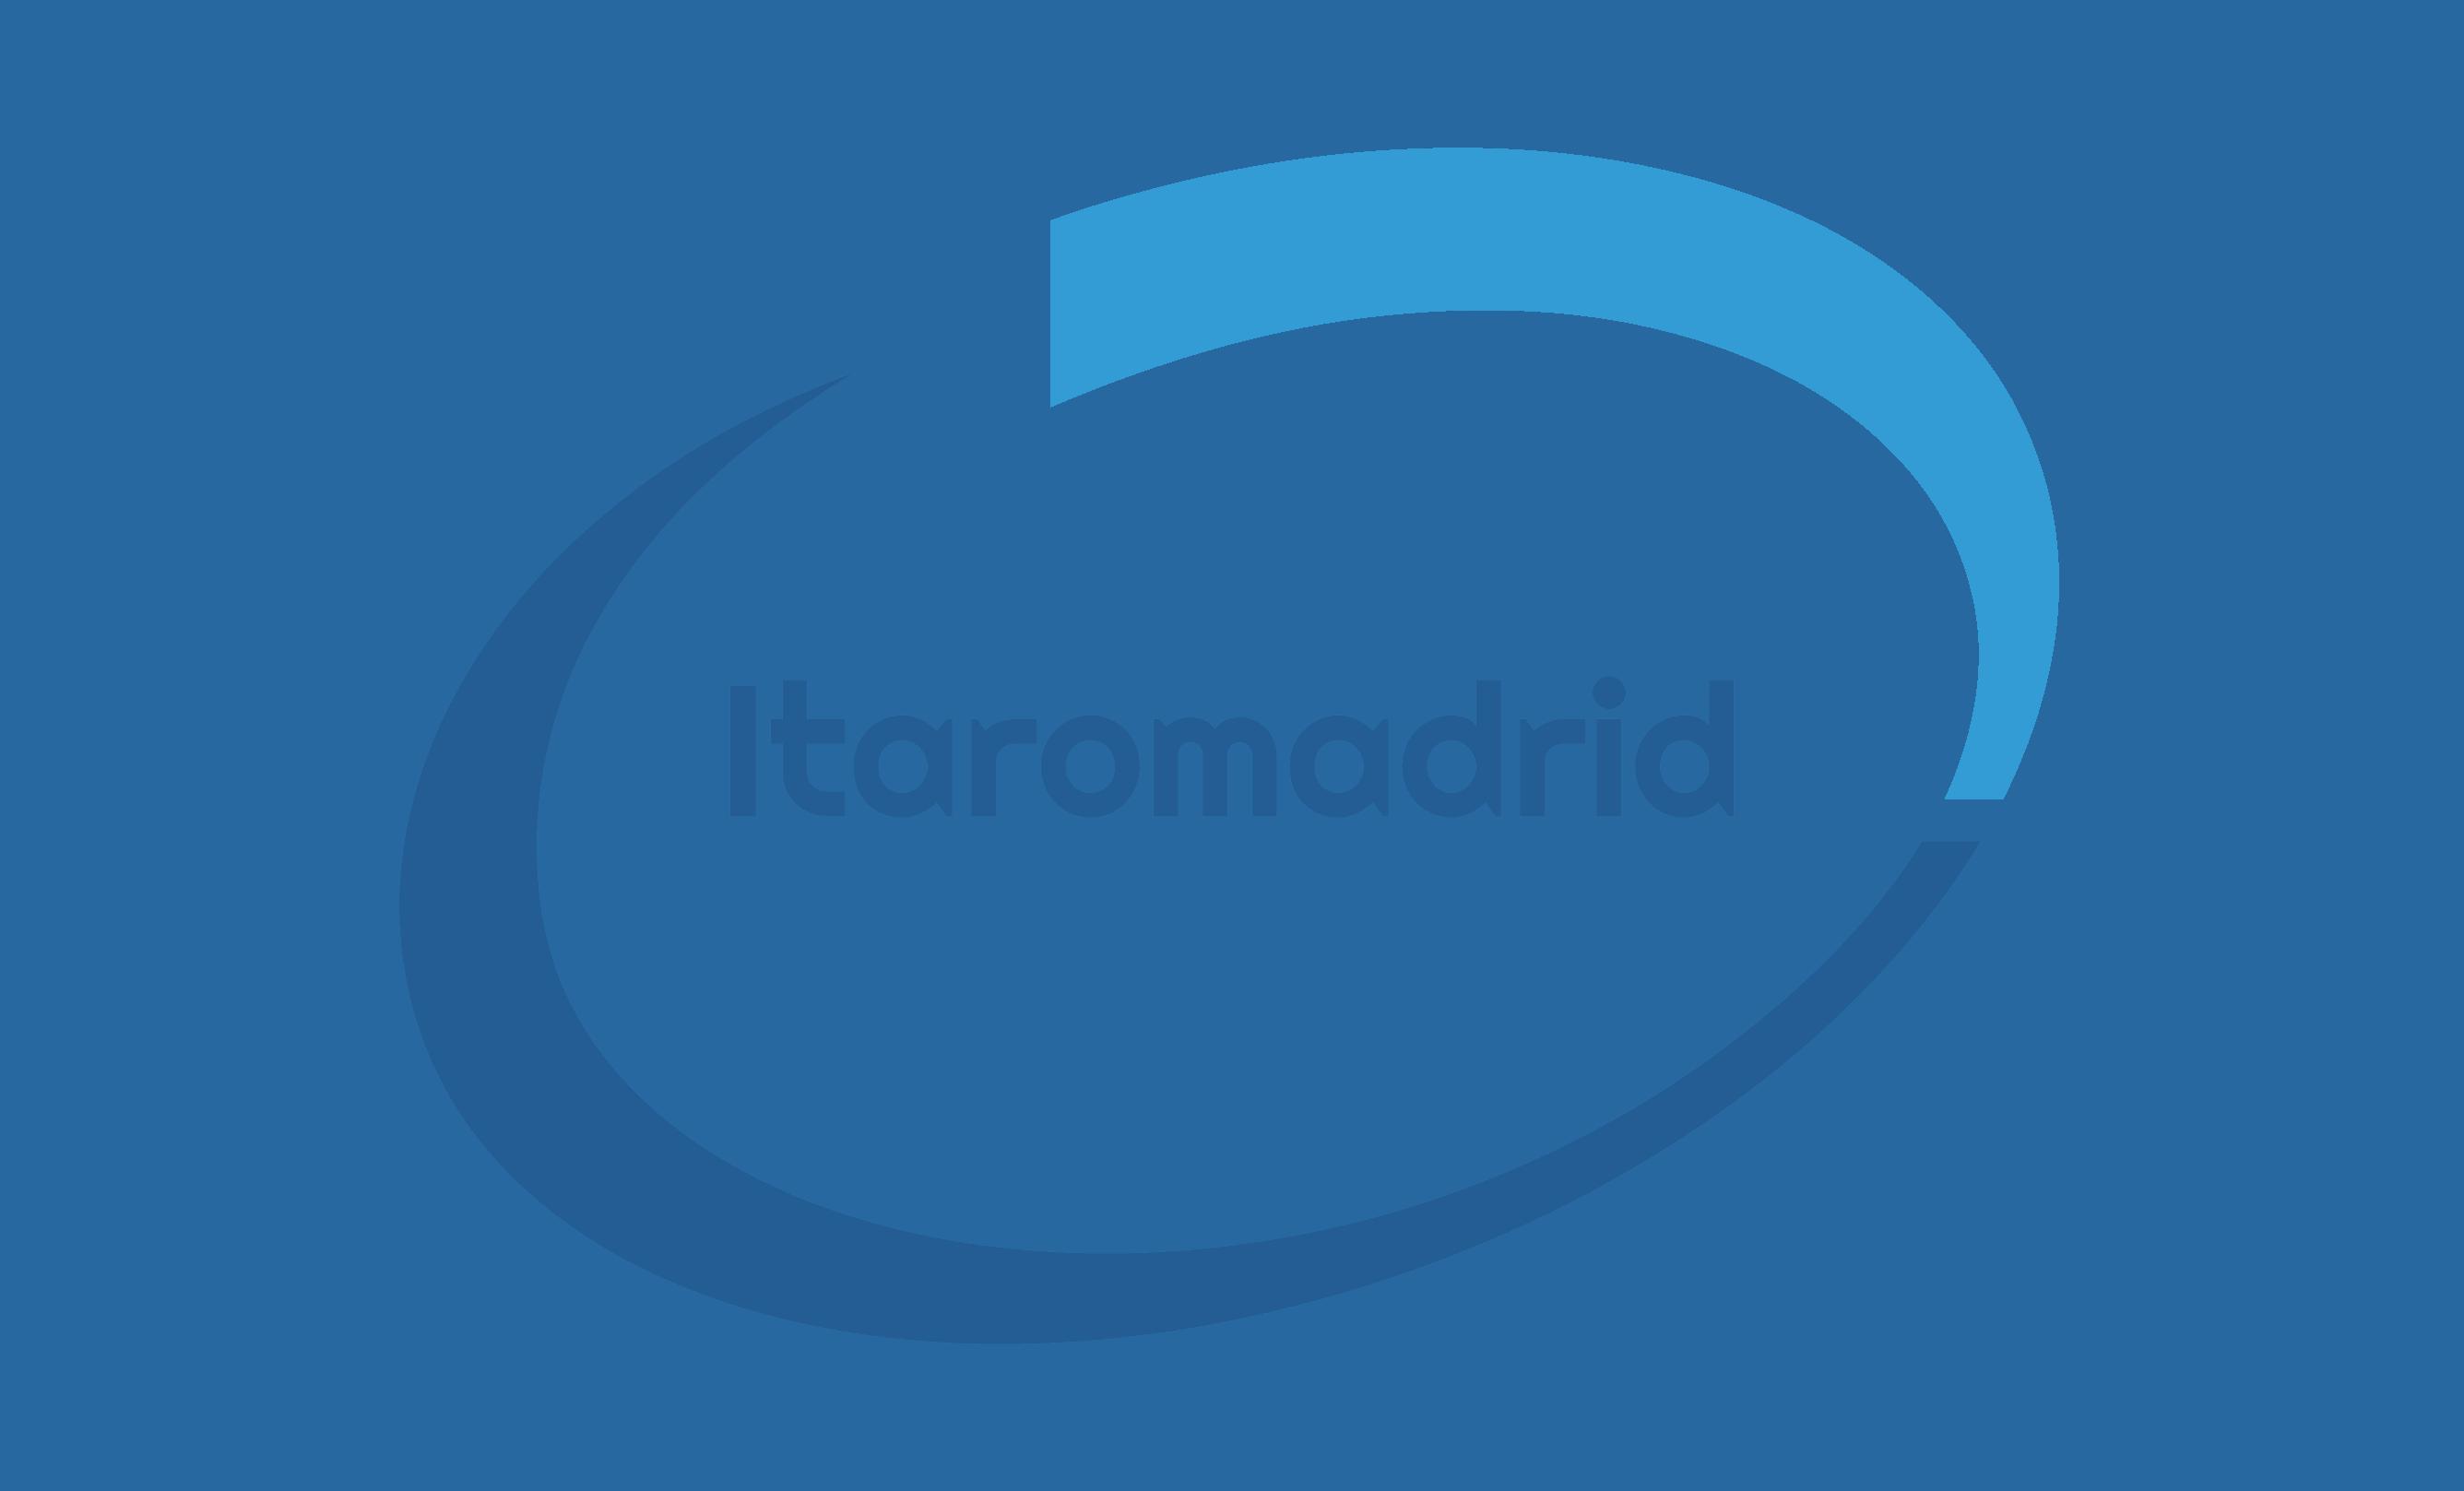 Itaromadrid